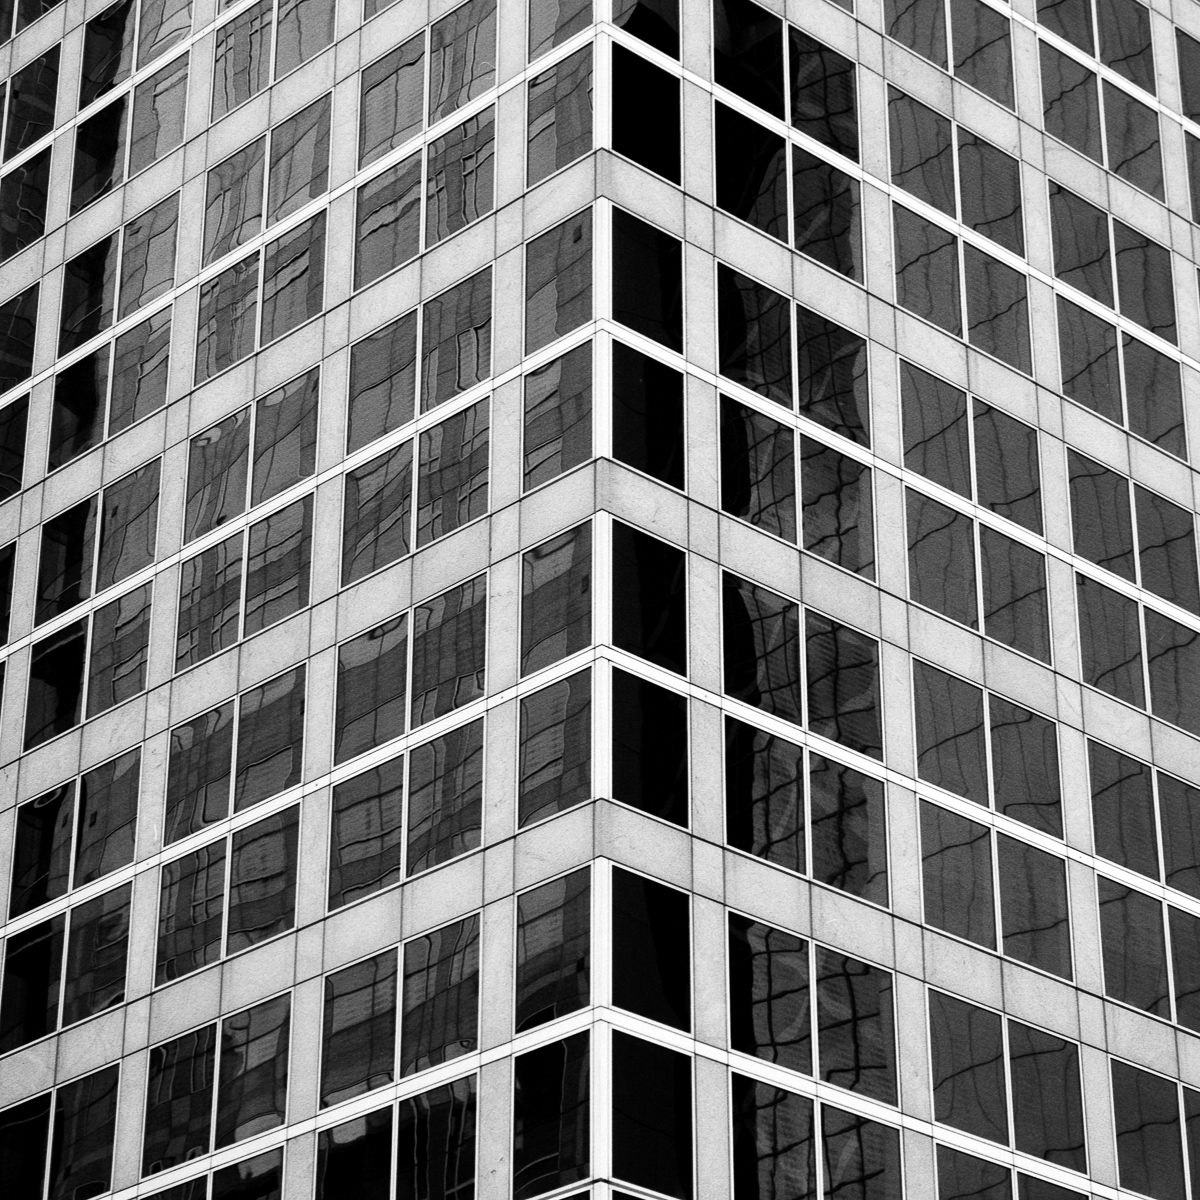 Architecture - 元佳意城